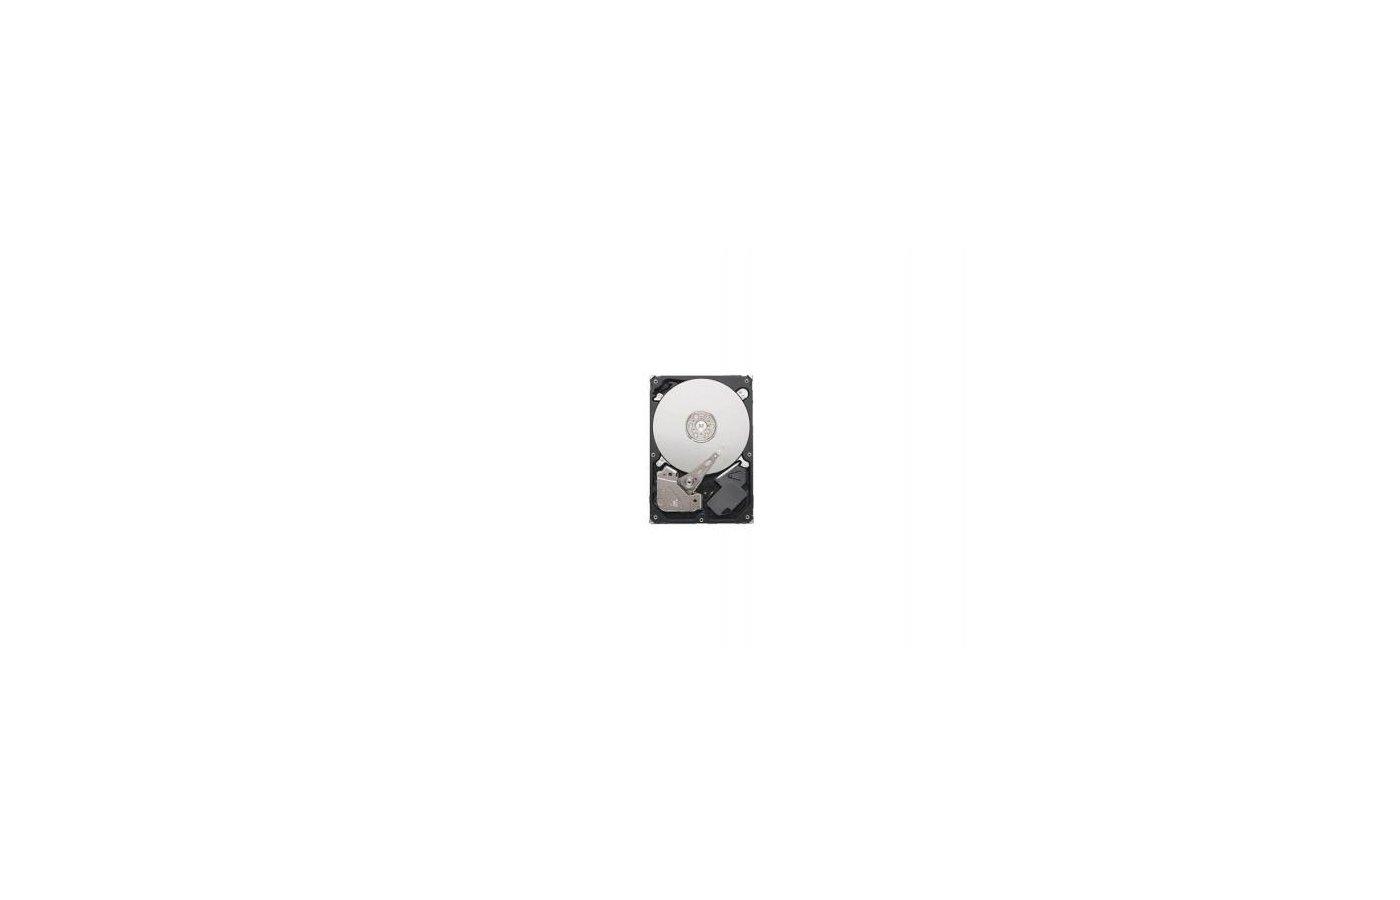 Жесткий диск Seagate SATA-II 1Tb ST1000VM002 (5900rpm) 64Mb 3.5